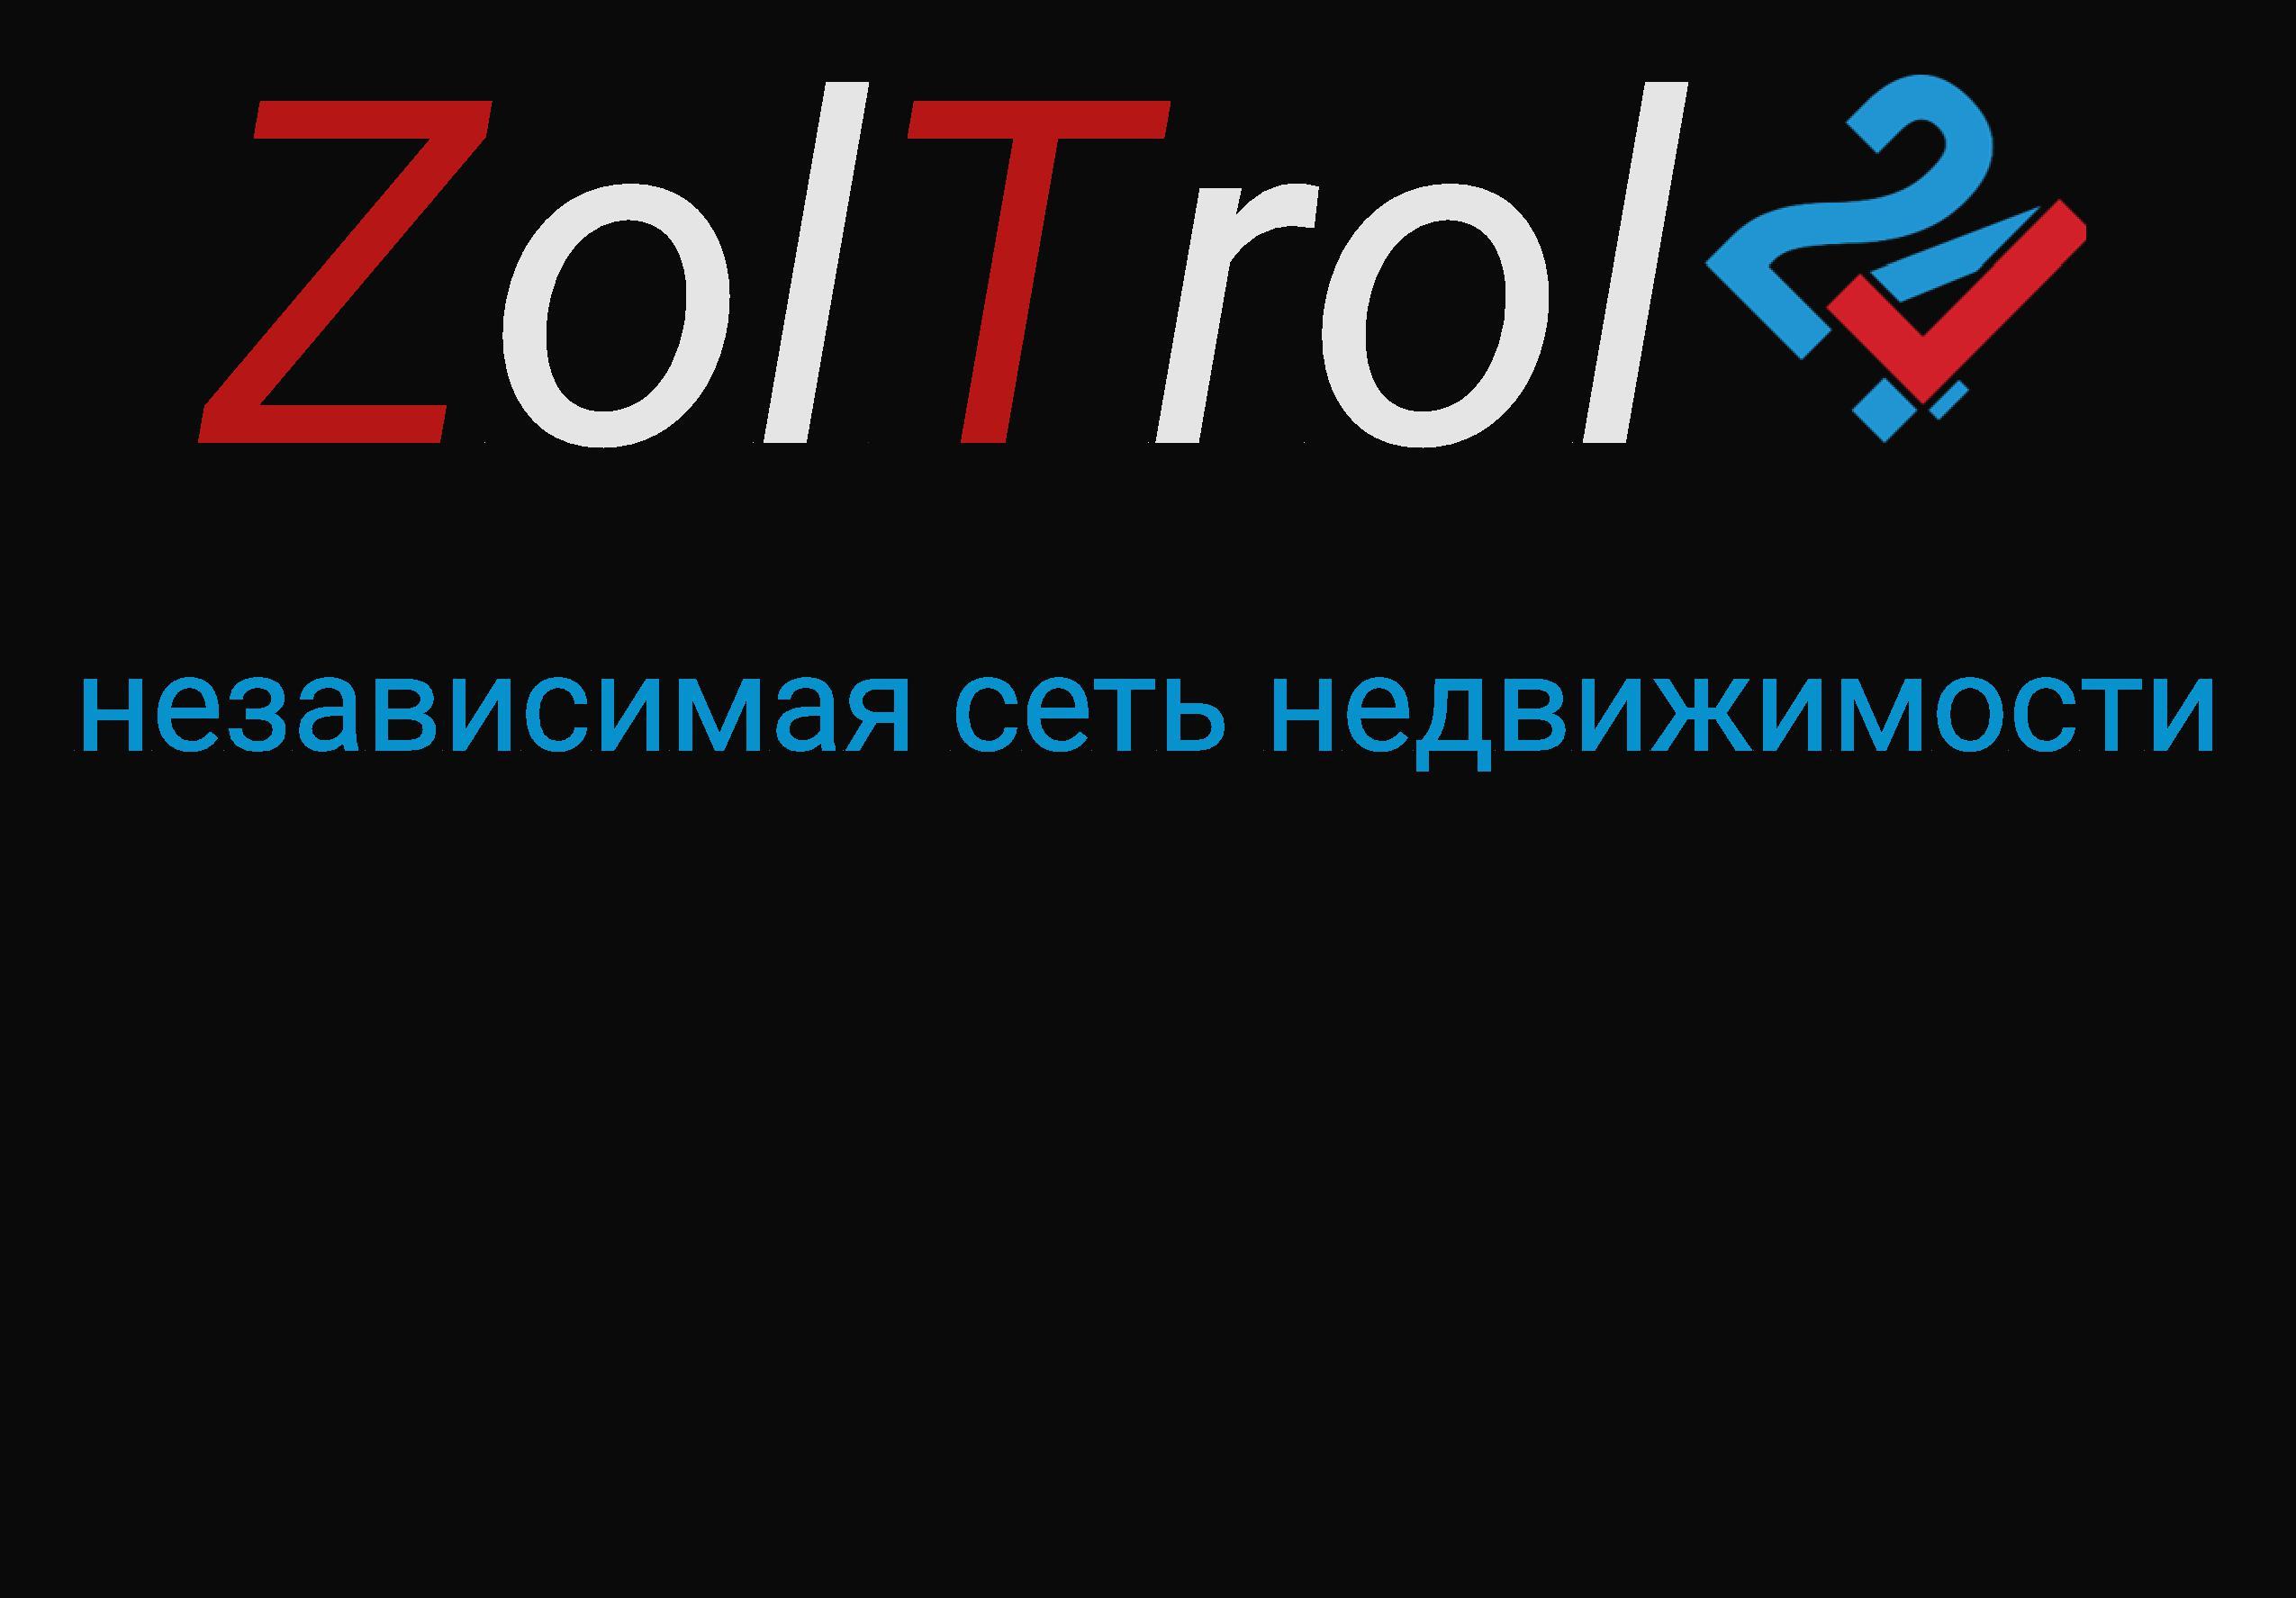 Логотип и фирменный стиль ZolTor24 фото f_3945c87aed7522f2.jpg